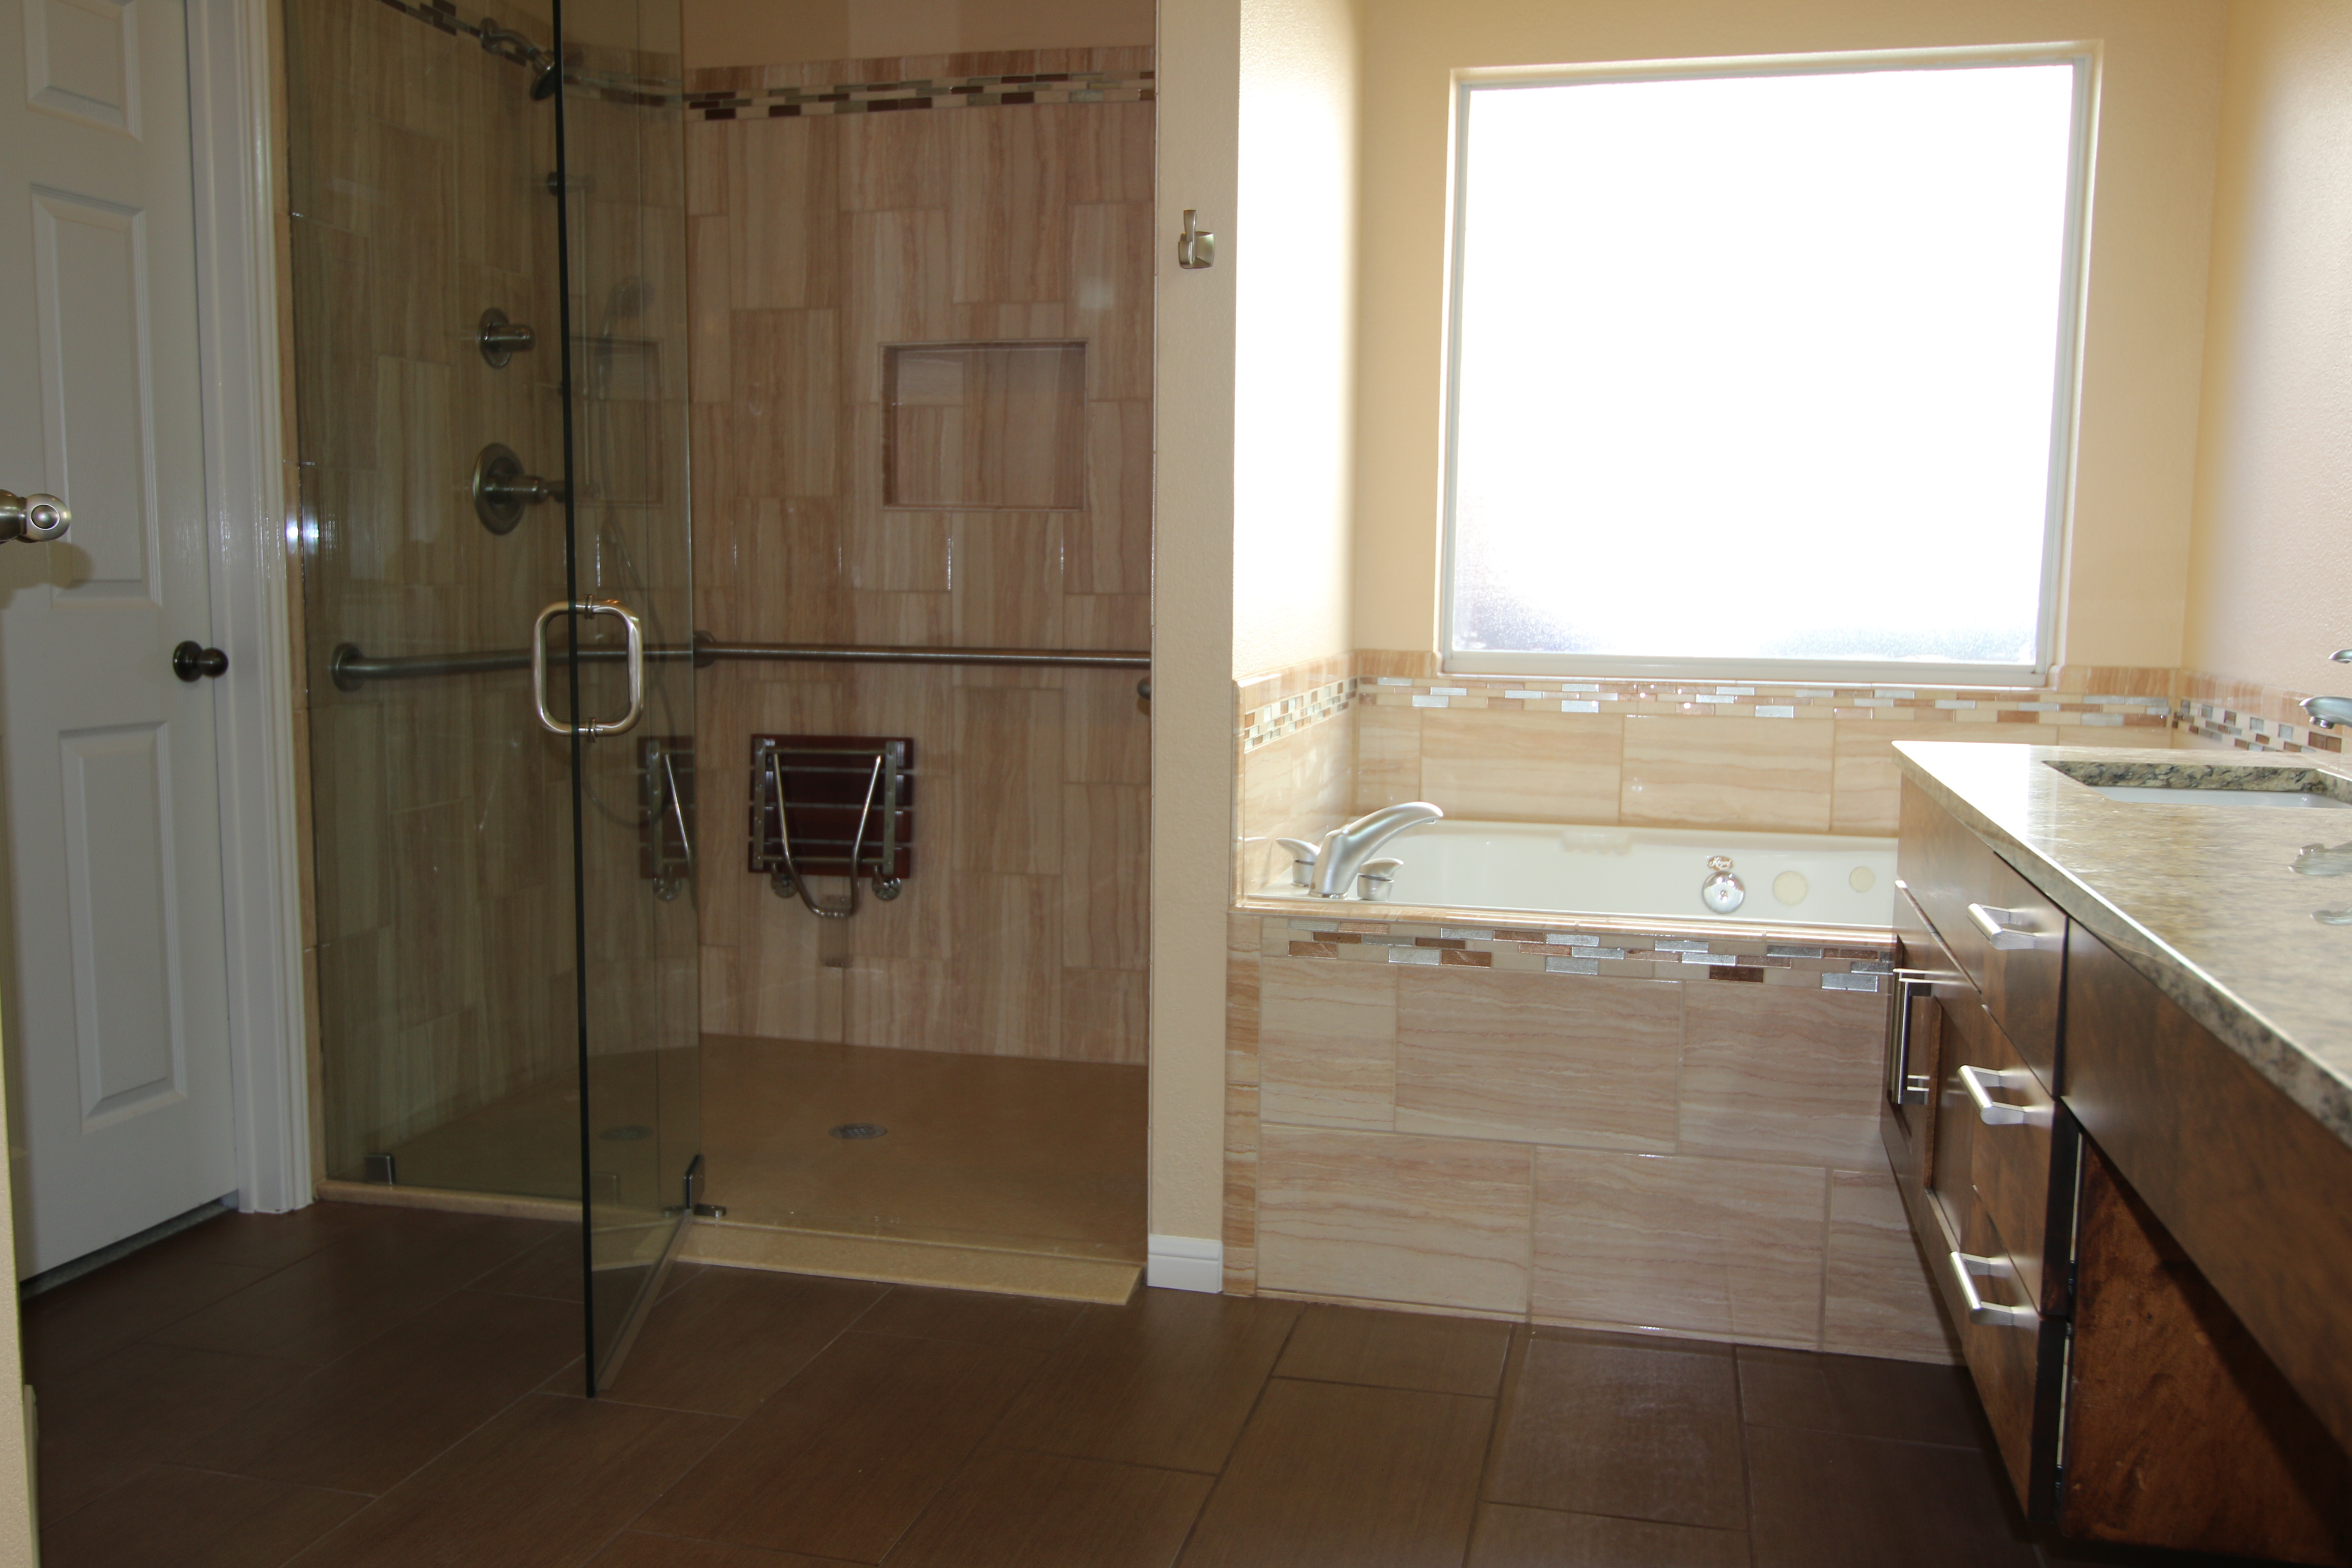 Handicap Home Modifications In Austin Texas - Bathroom remodeling austin texas